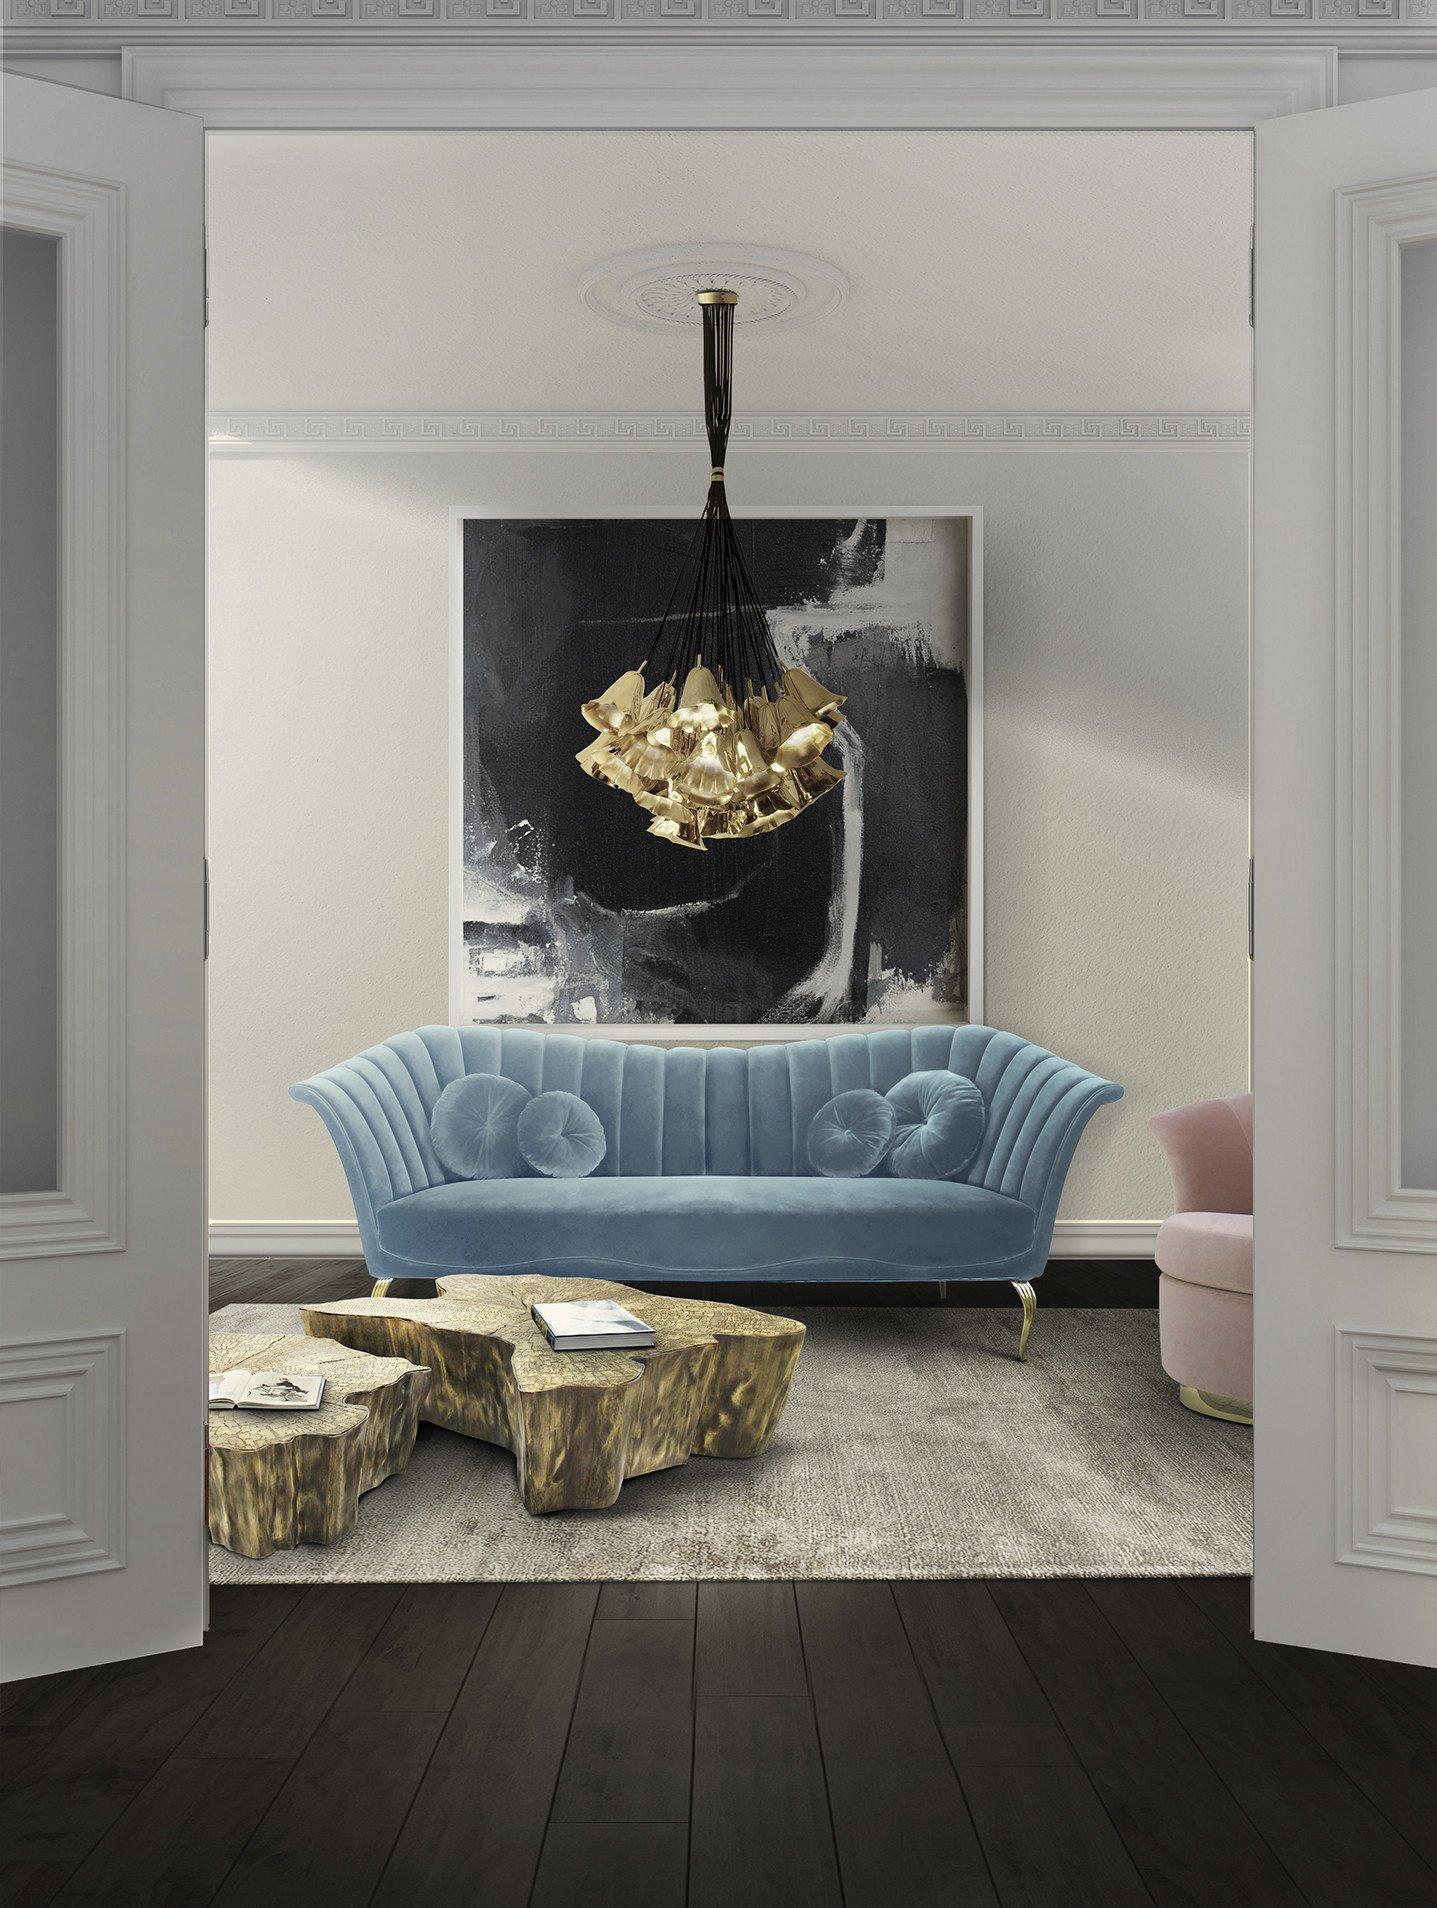 Black Bedroom Furniture Decor Inspirational 16 Spectacular Gray Hardwood Floors Bedroom